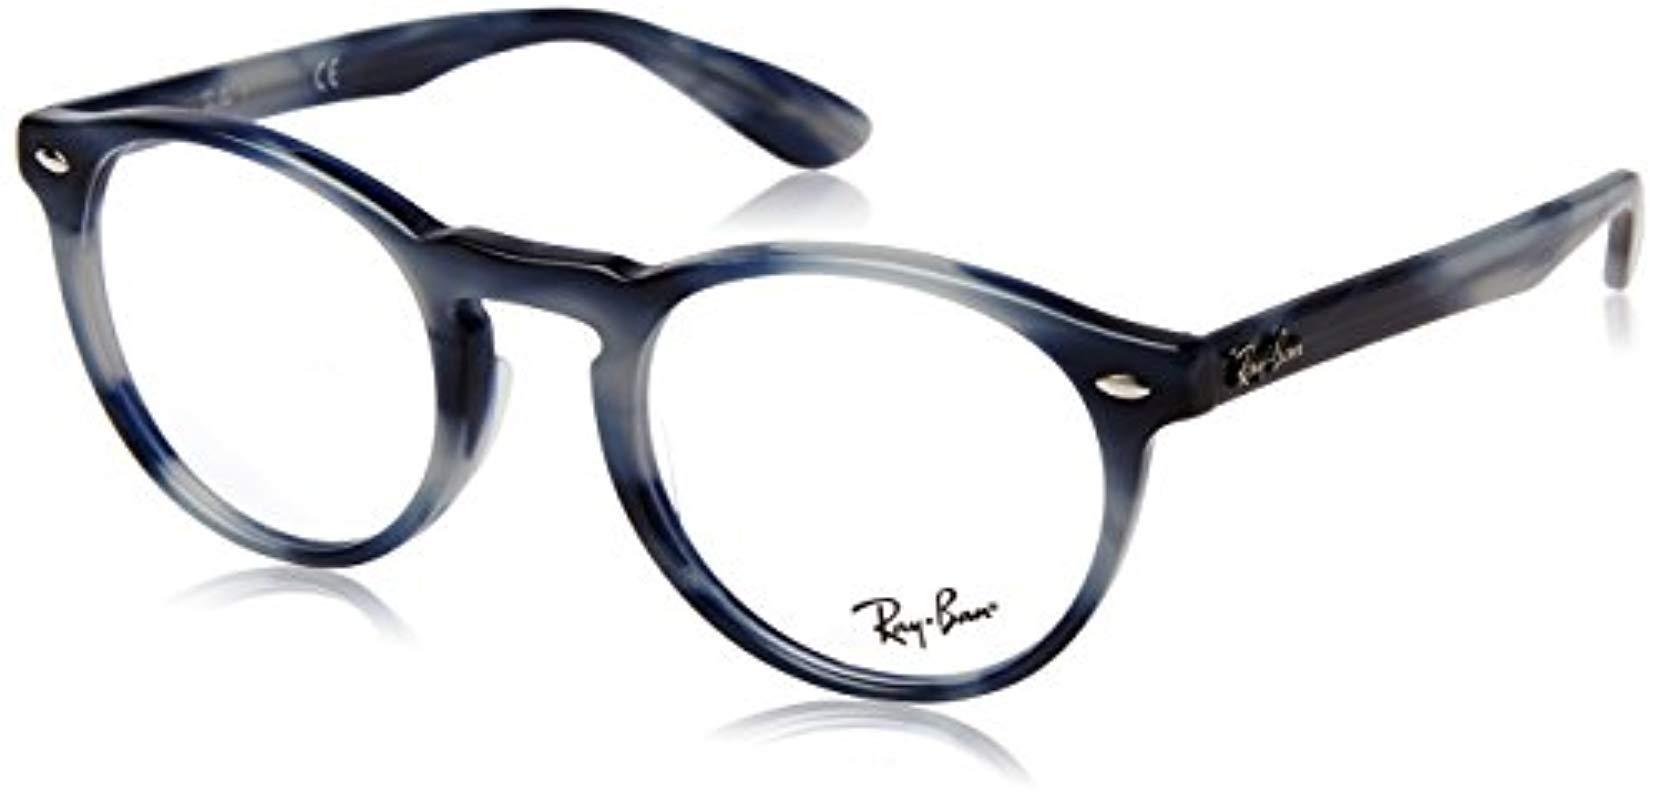 8943d6110e9 Ray-Ban. Women s Gray  s 0rx 5283 5773 49 Optical Frames ...